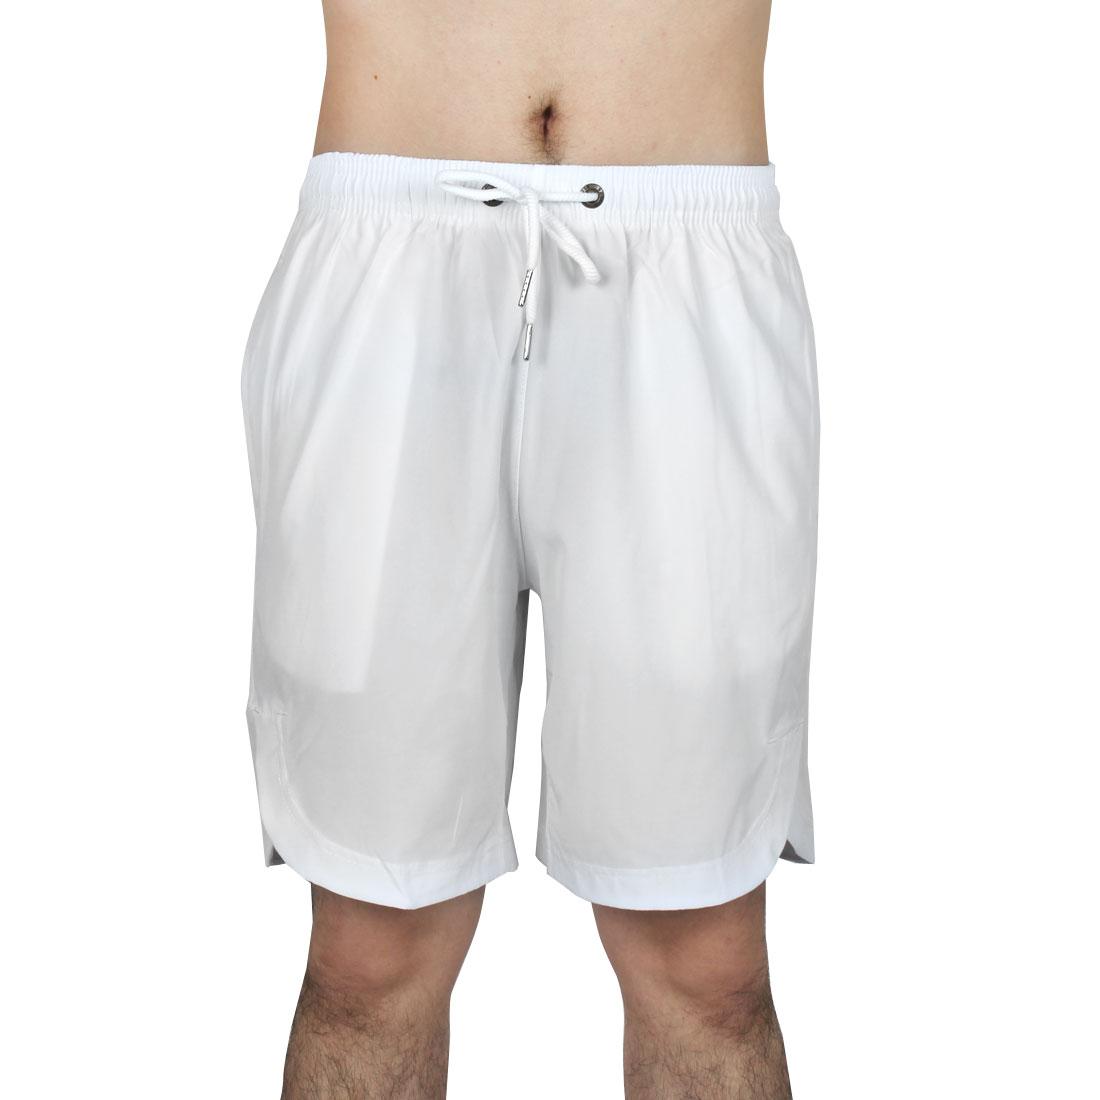 Men Athletics Running Polyester Summer Beach Surf Board Shorts Pants White W28